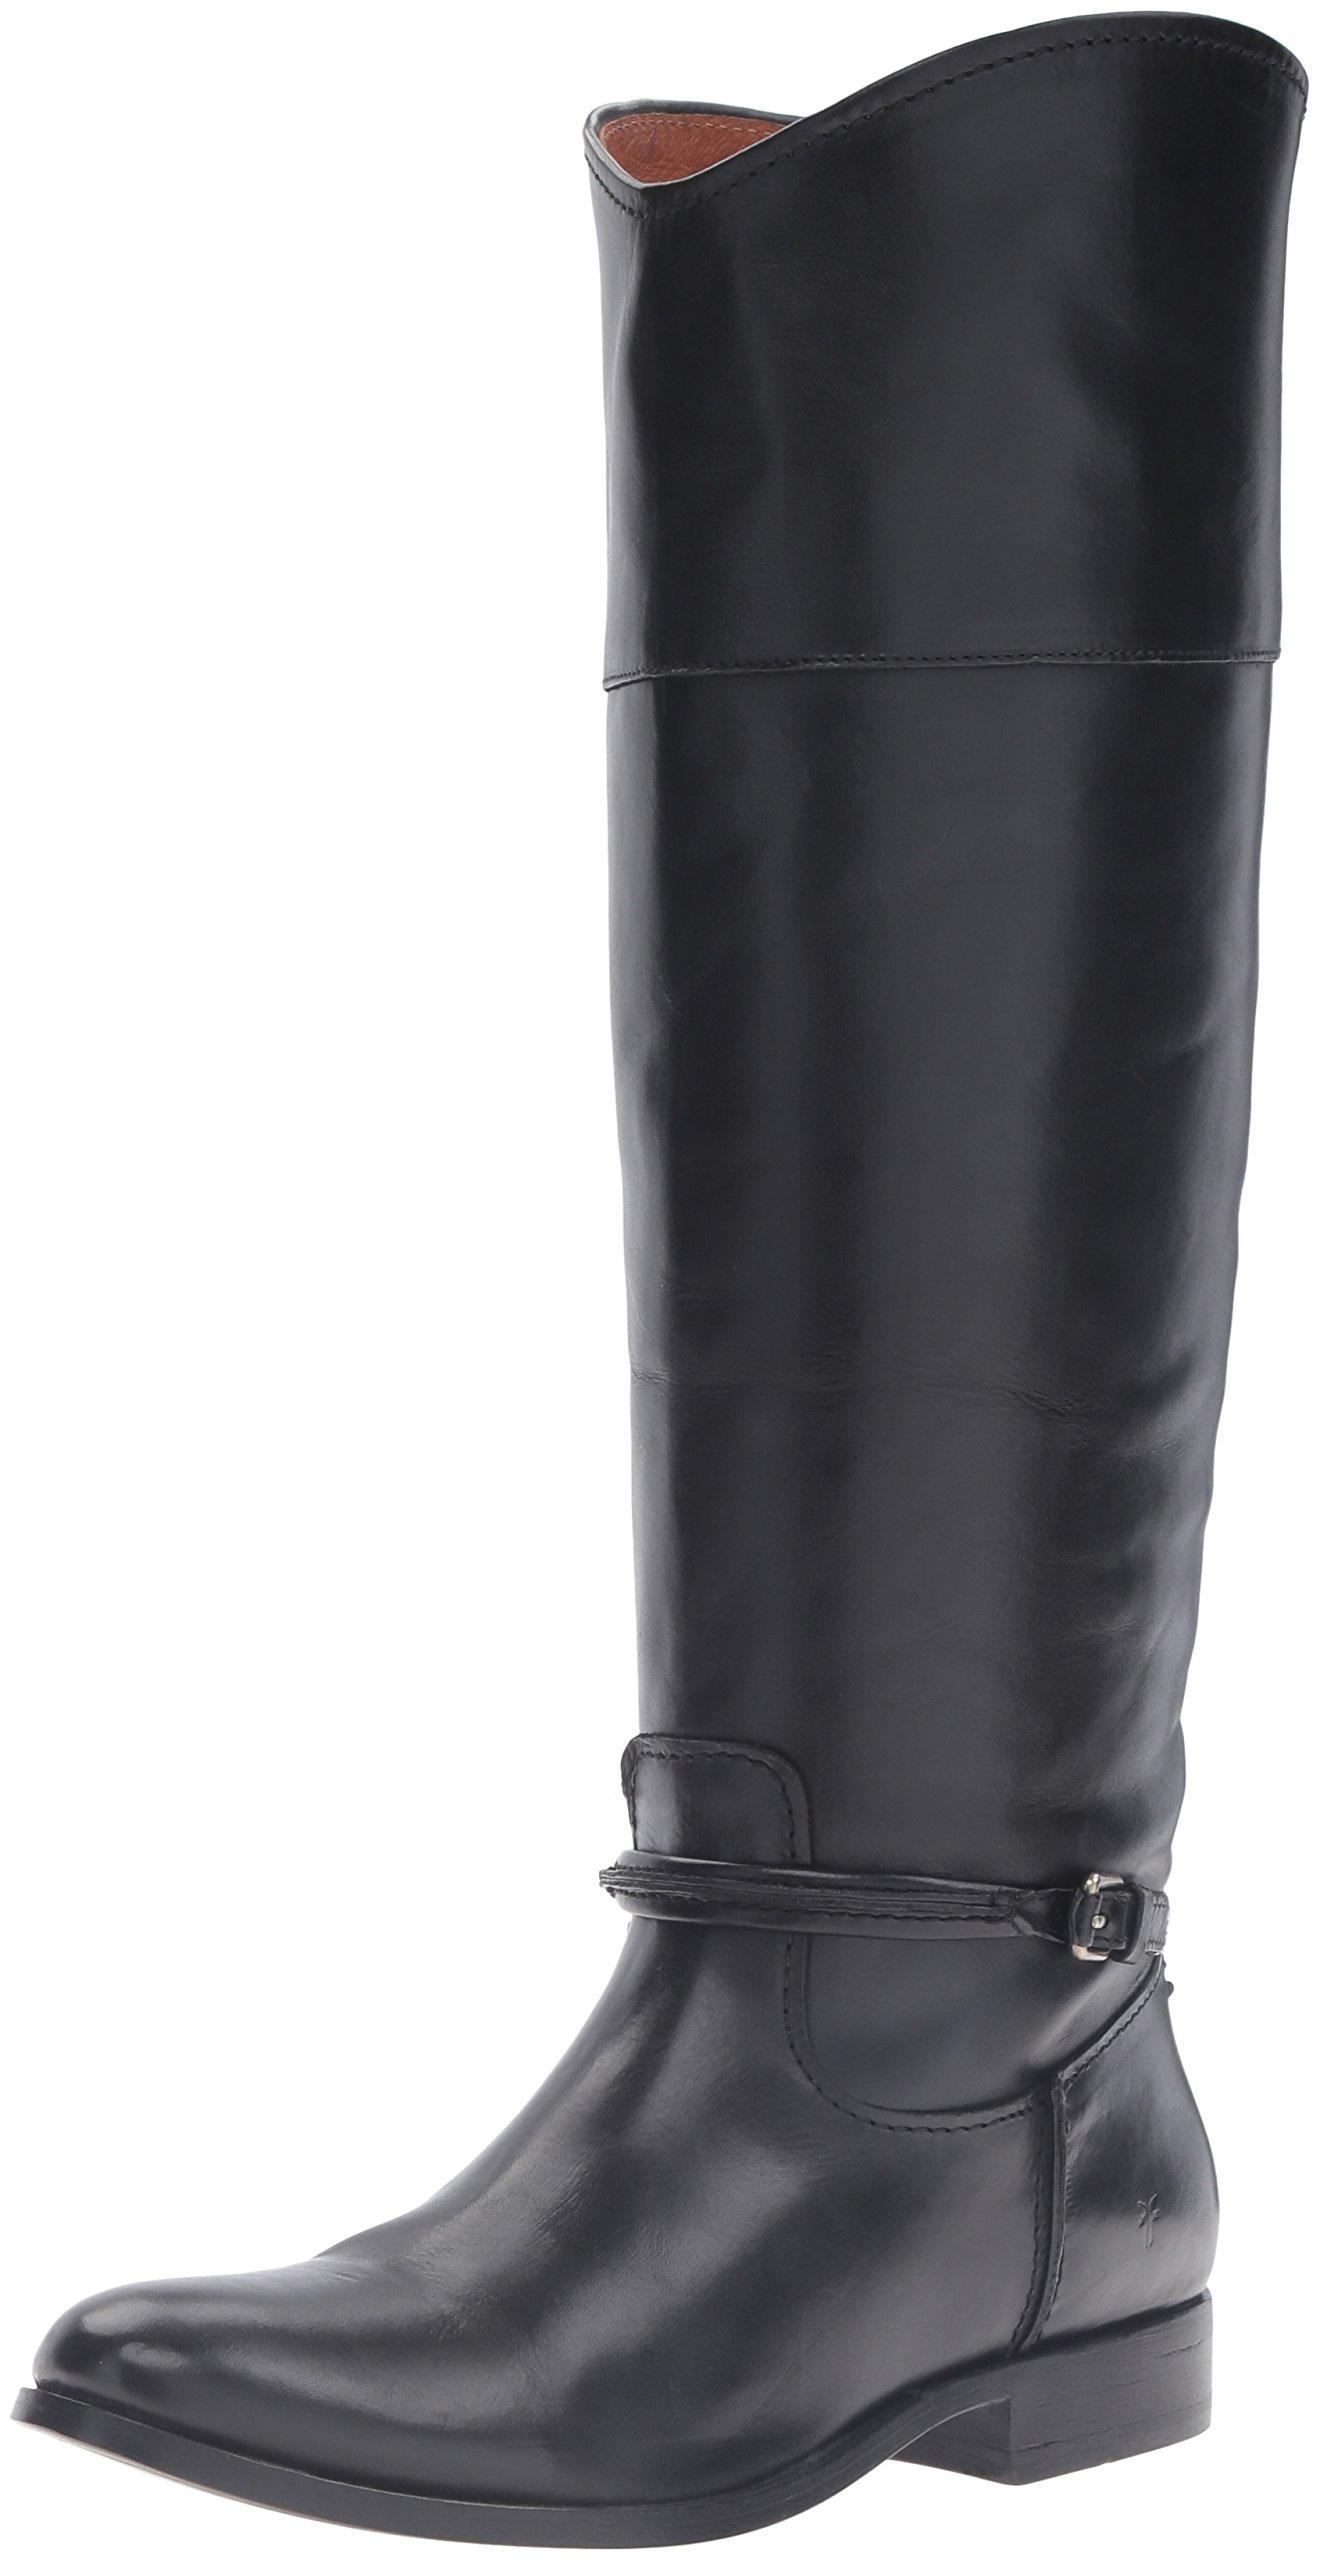 FRYE Women's Melissa Seam Tall Riding Boot, Black, 7.5 M US